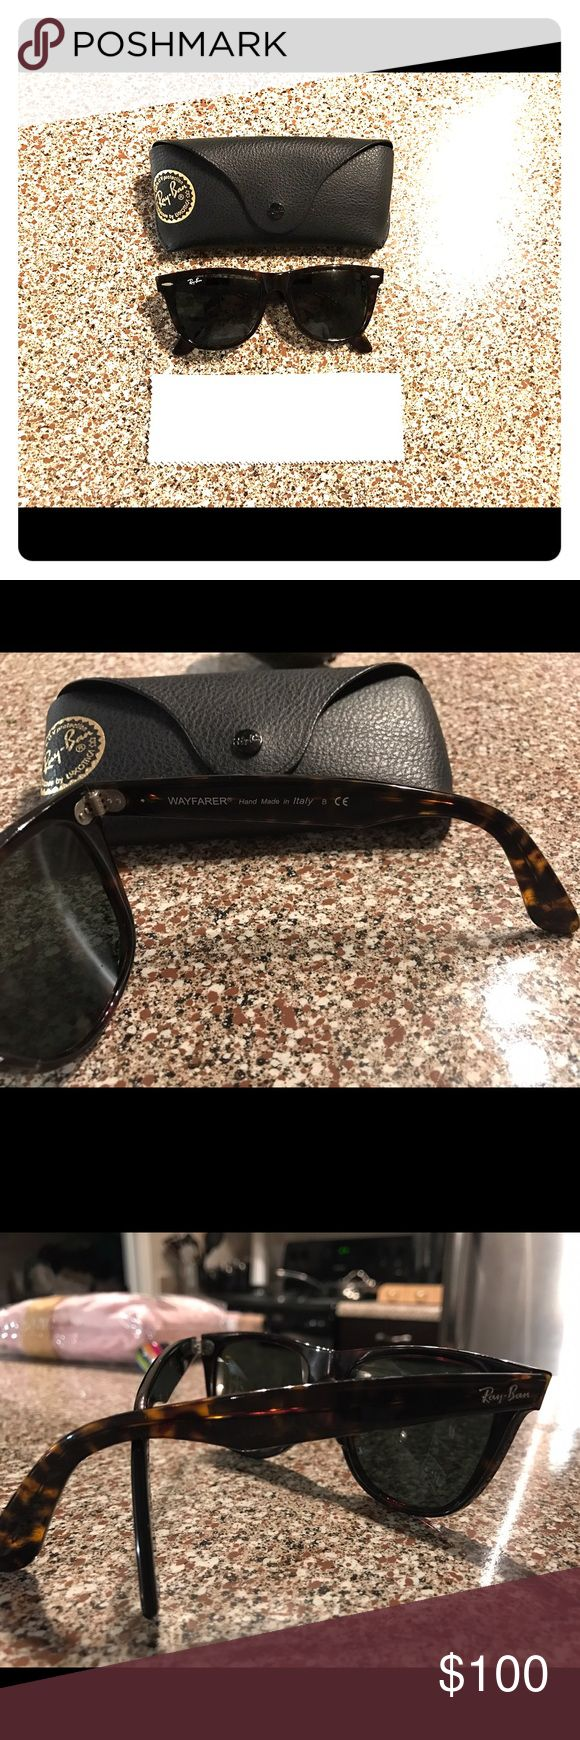 Ray-Ban Wayfarer sunglasses Like new condition Ray-Ban Accessories Glasses